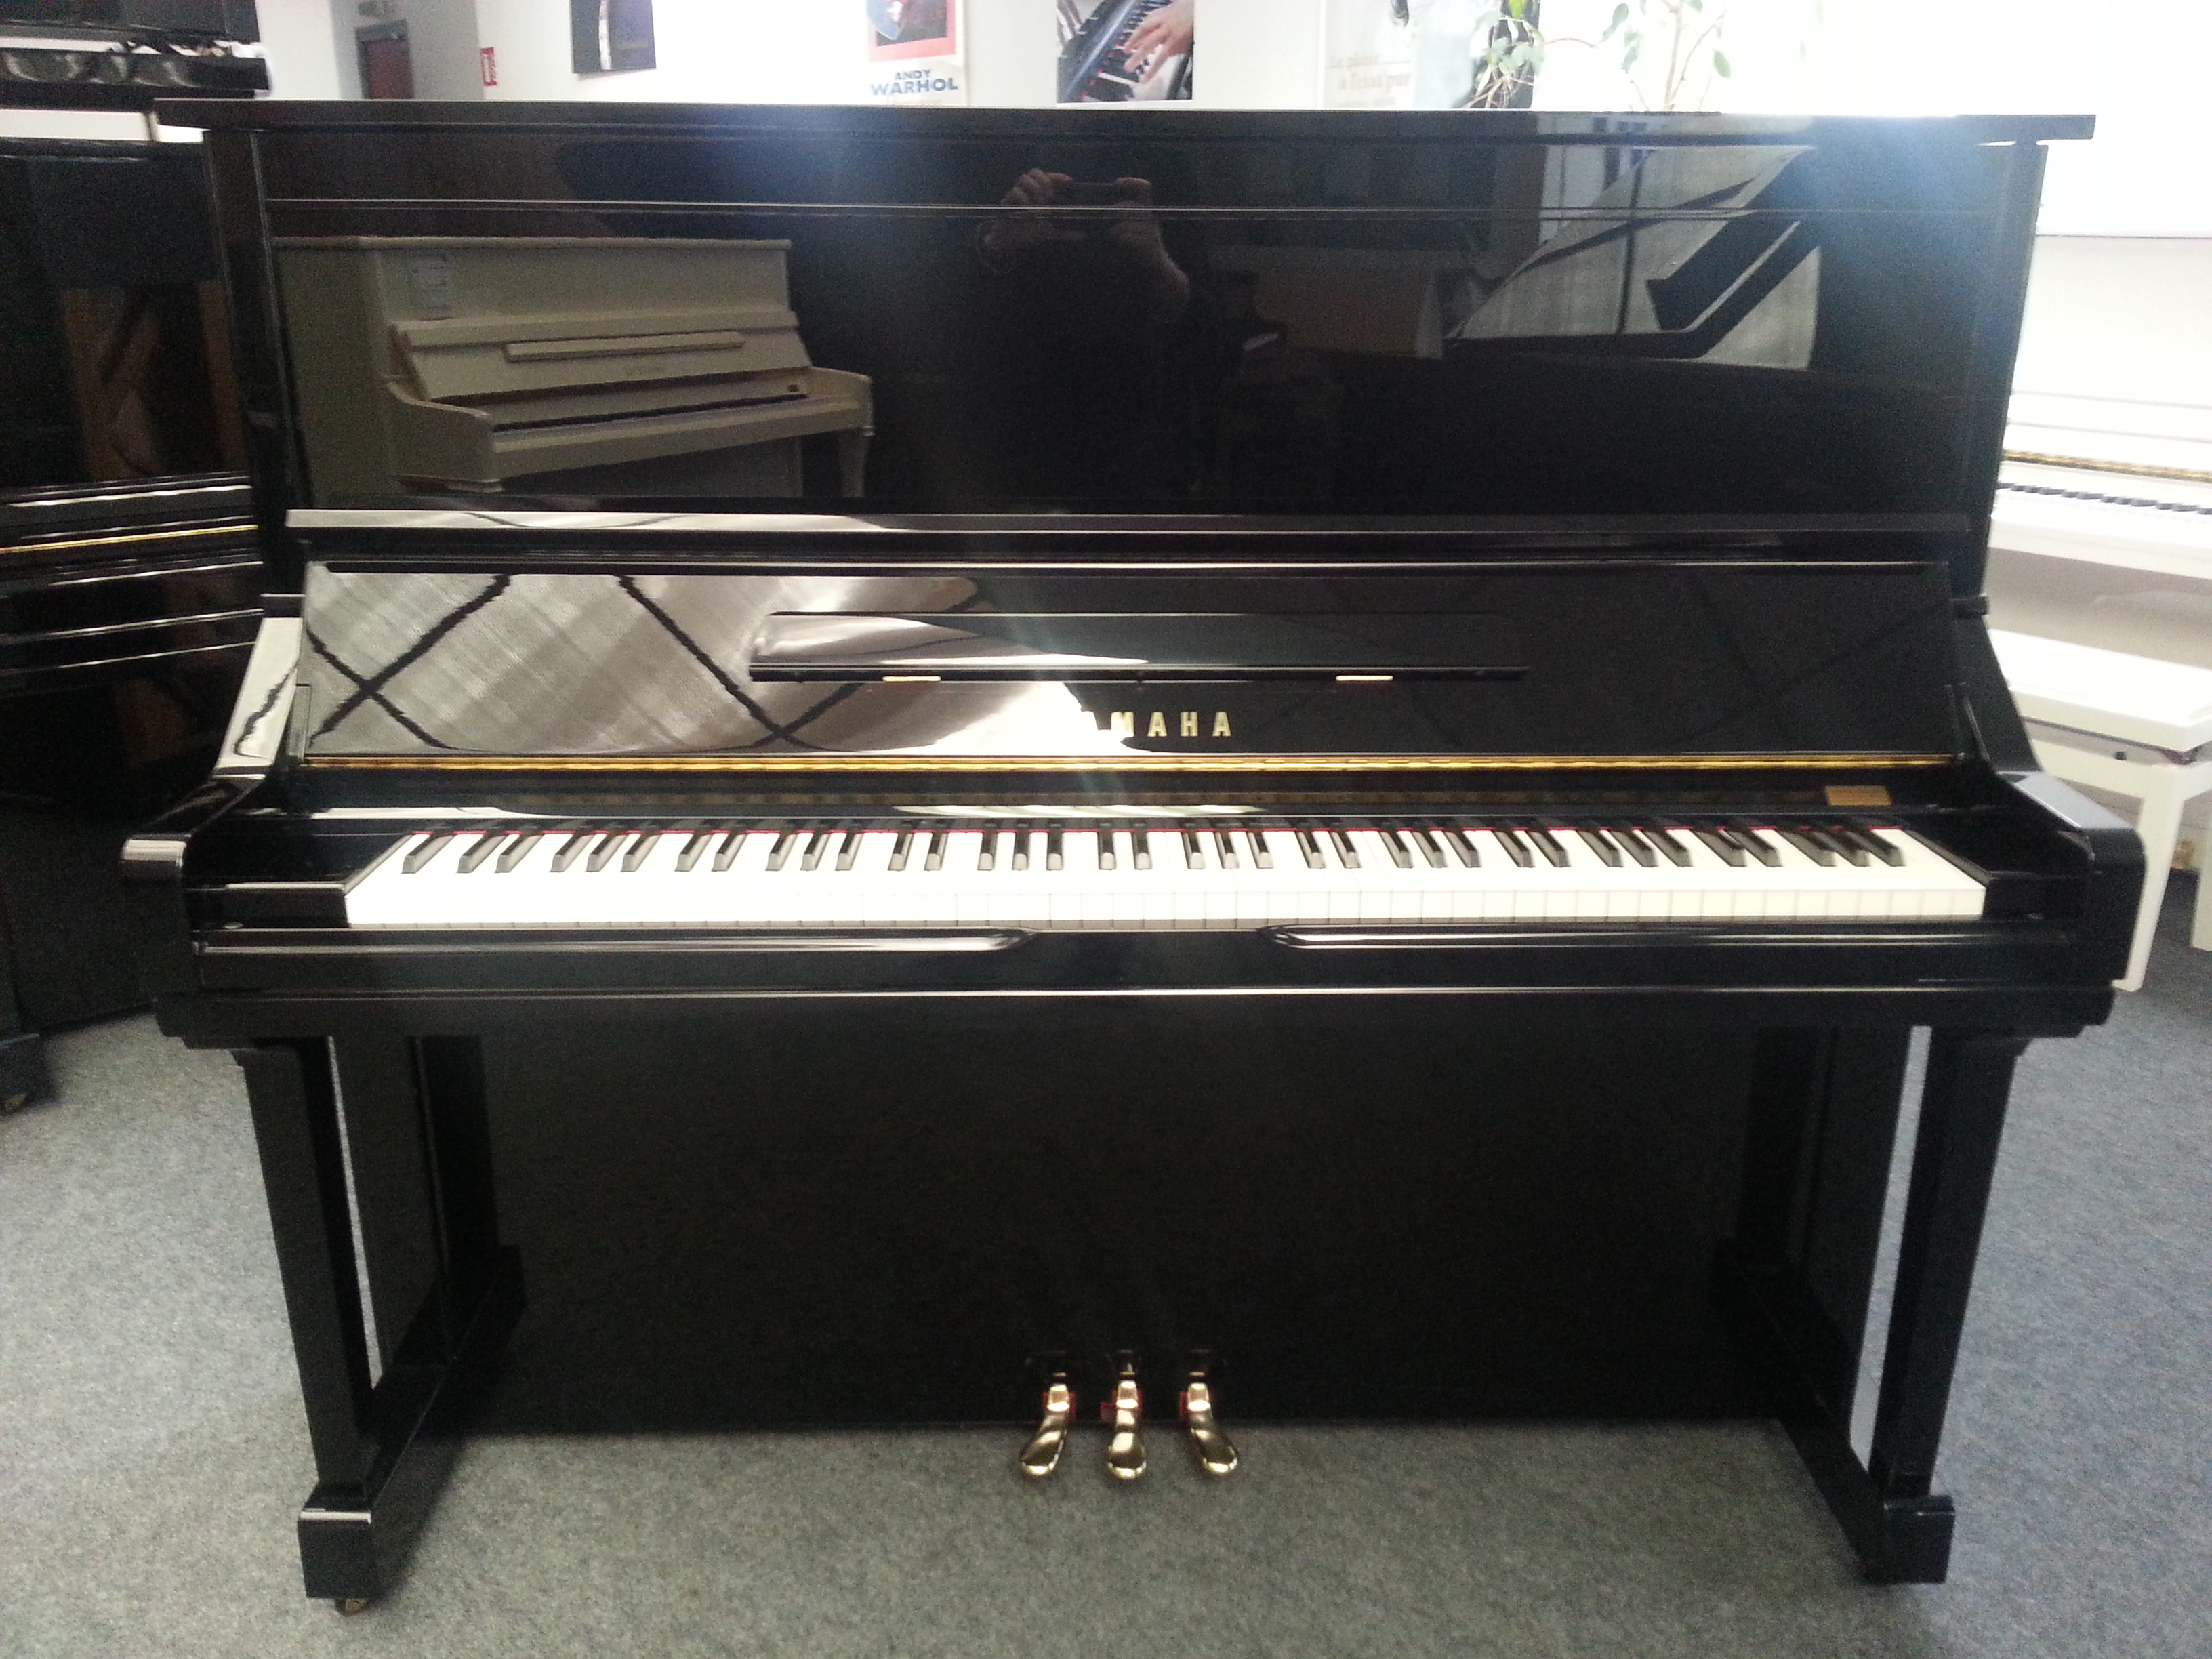 piano droit yamaha yu3 noir brillant lorraine audiofanzine. Black Bedroom Furniture Sets. Home Design Ideas